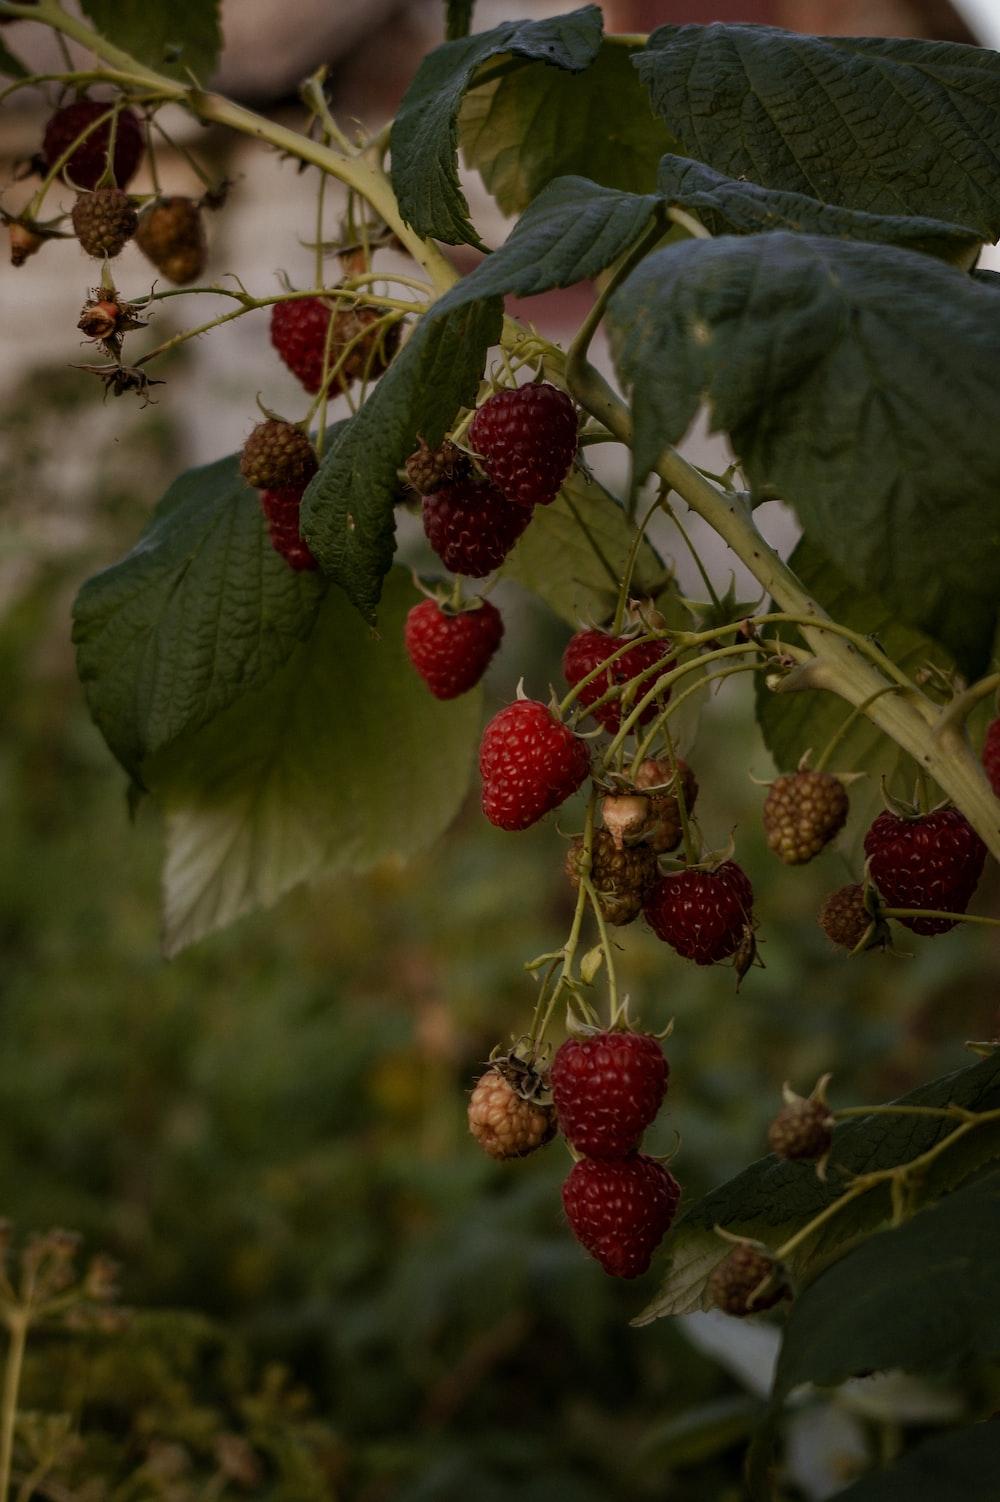 red raspberry fruit on green leaves